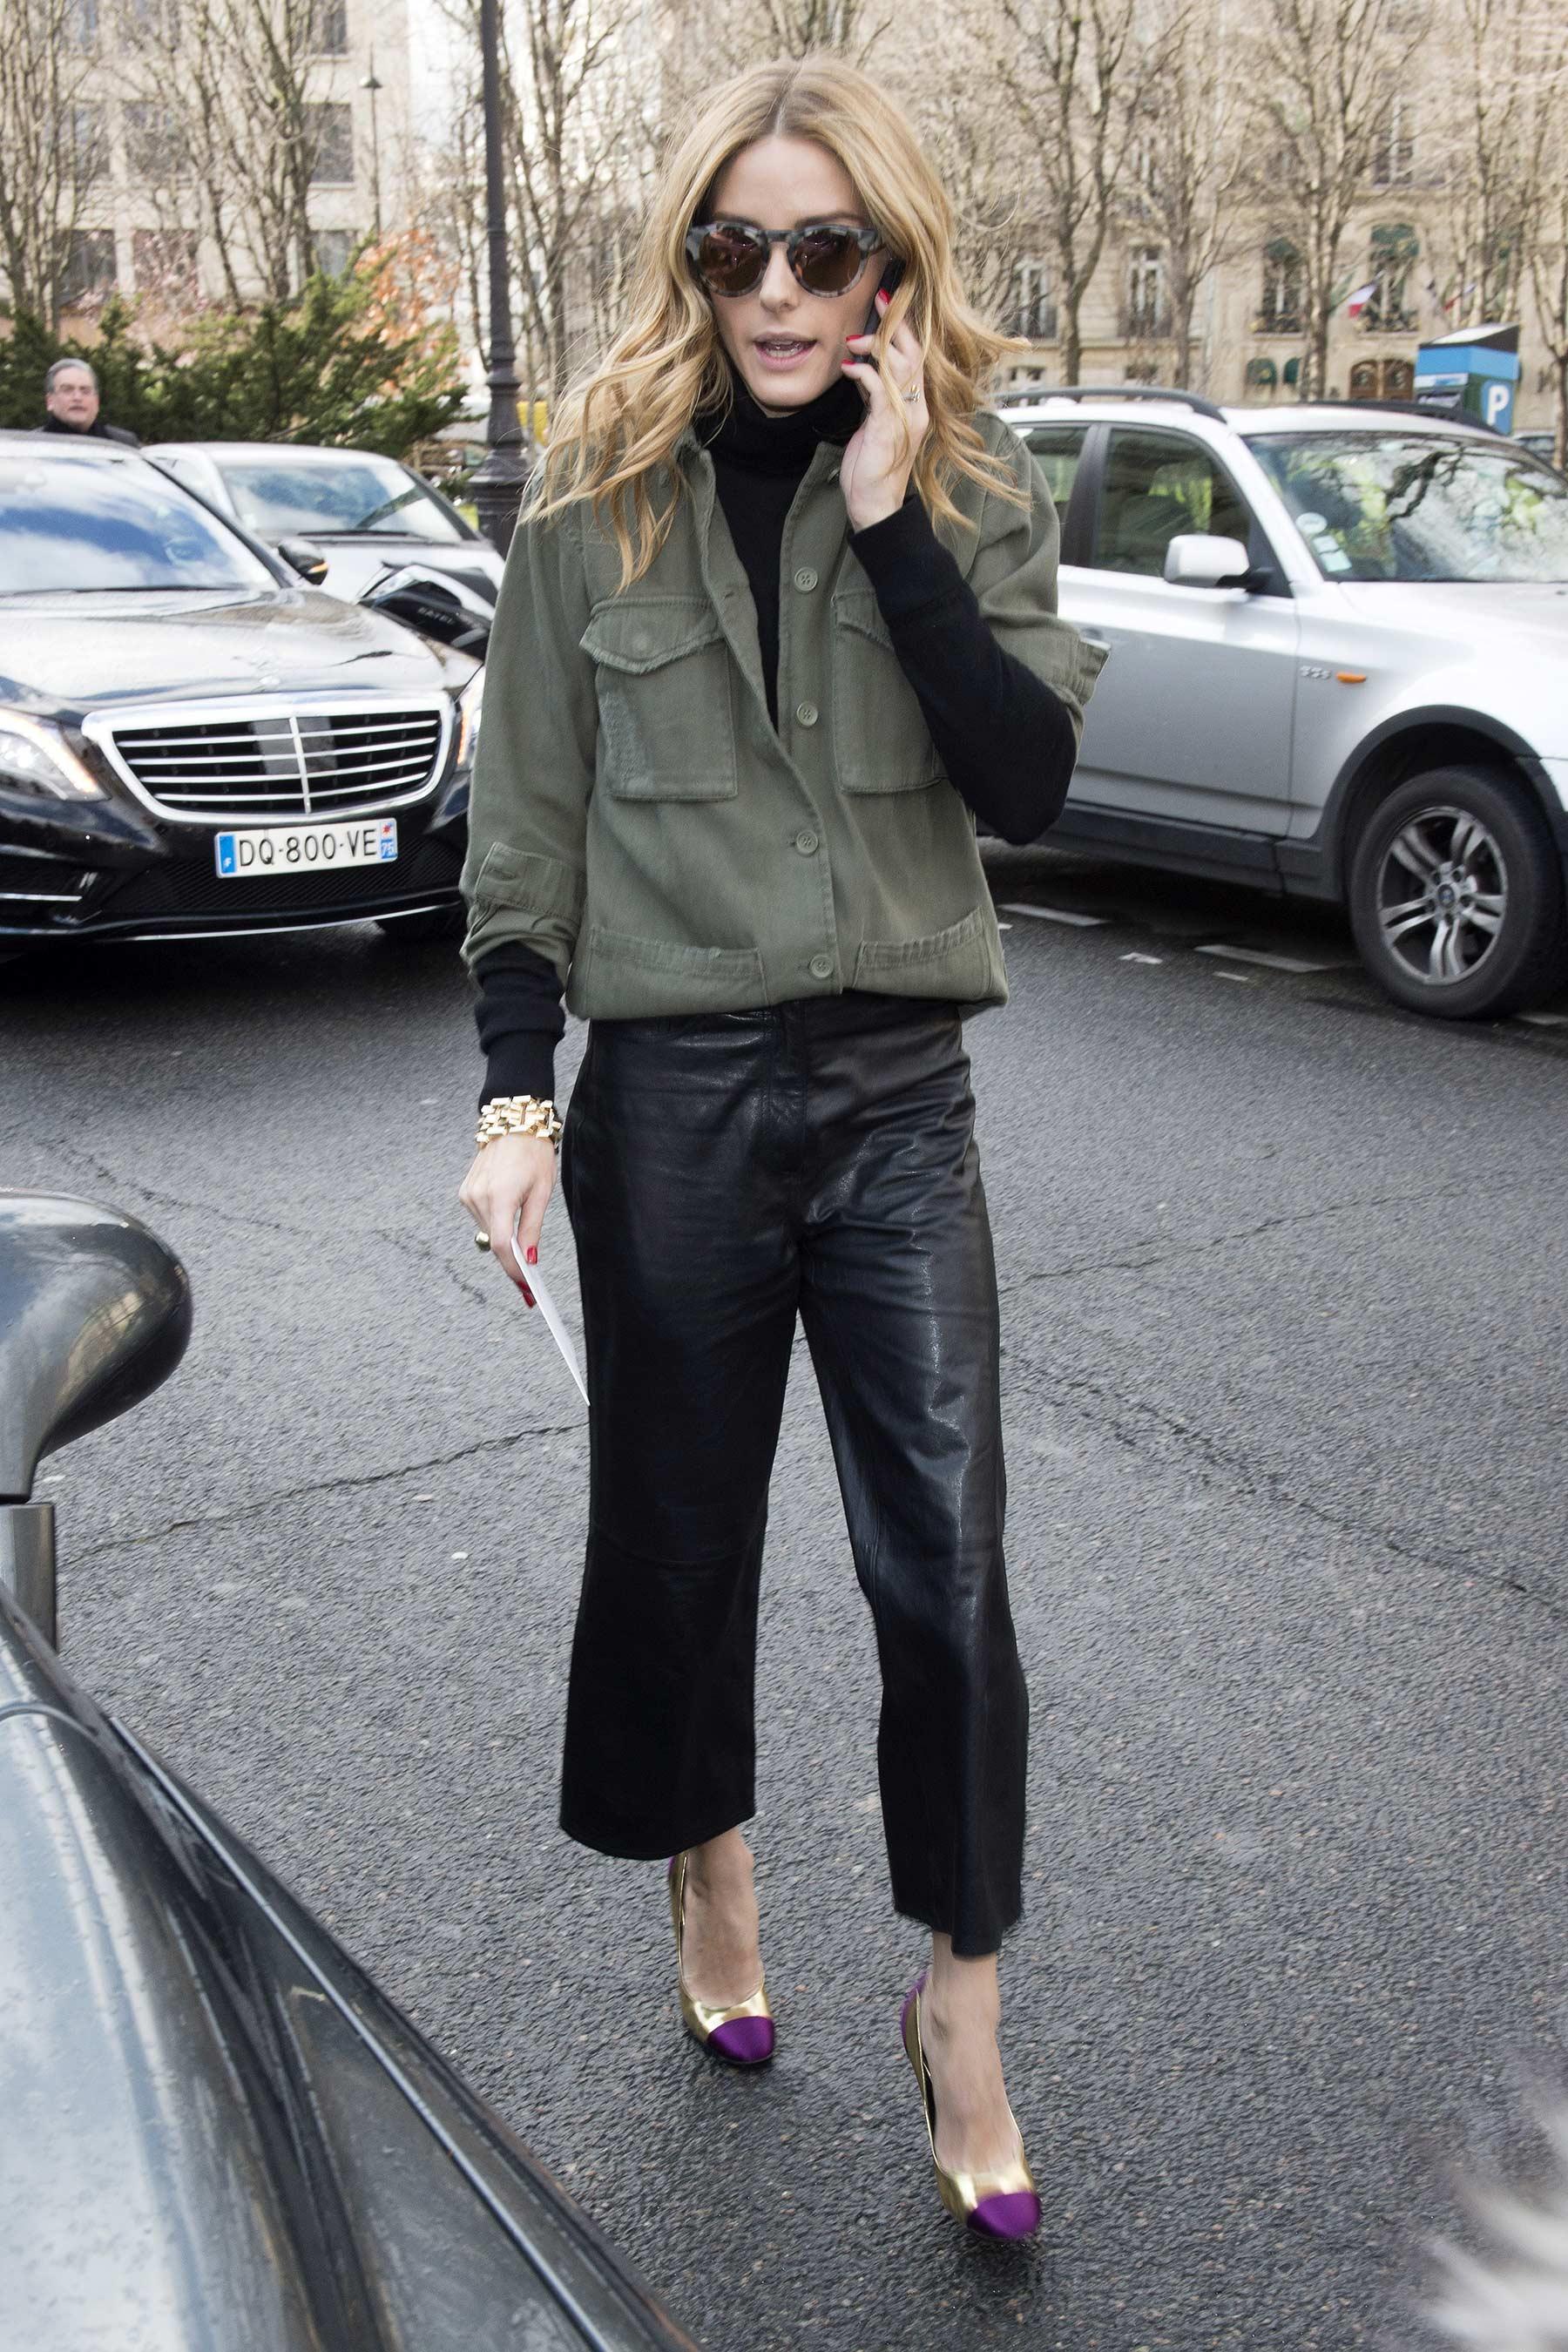 Olivia Palermo attends the Giambattista Valli show